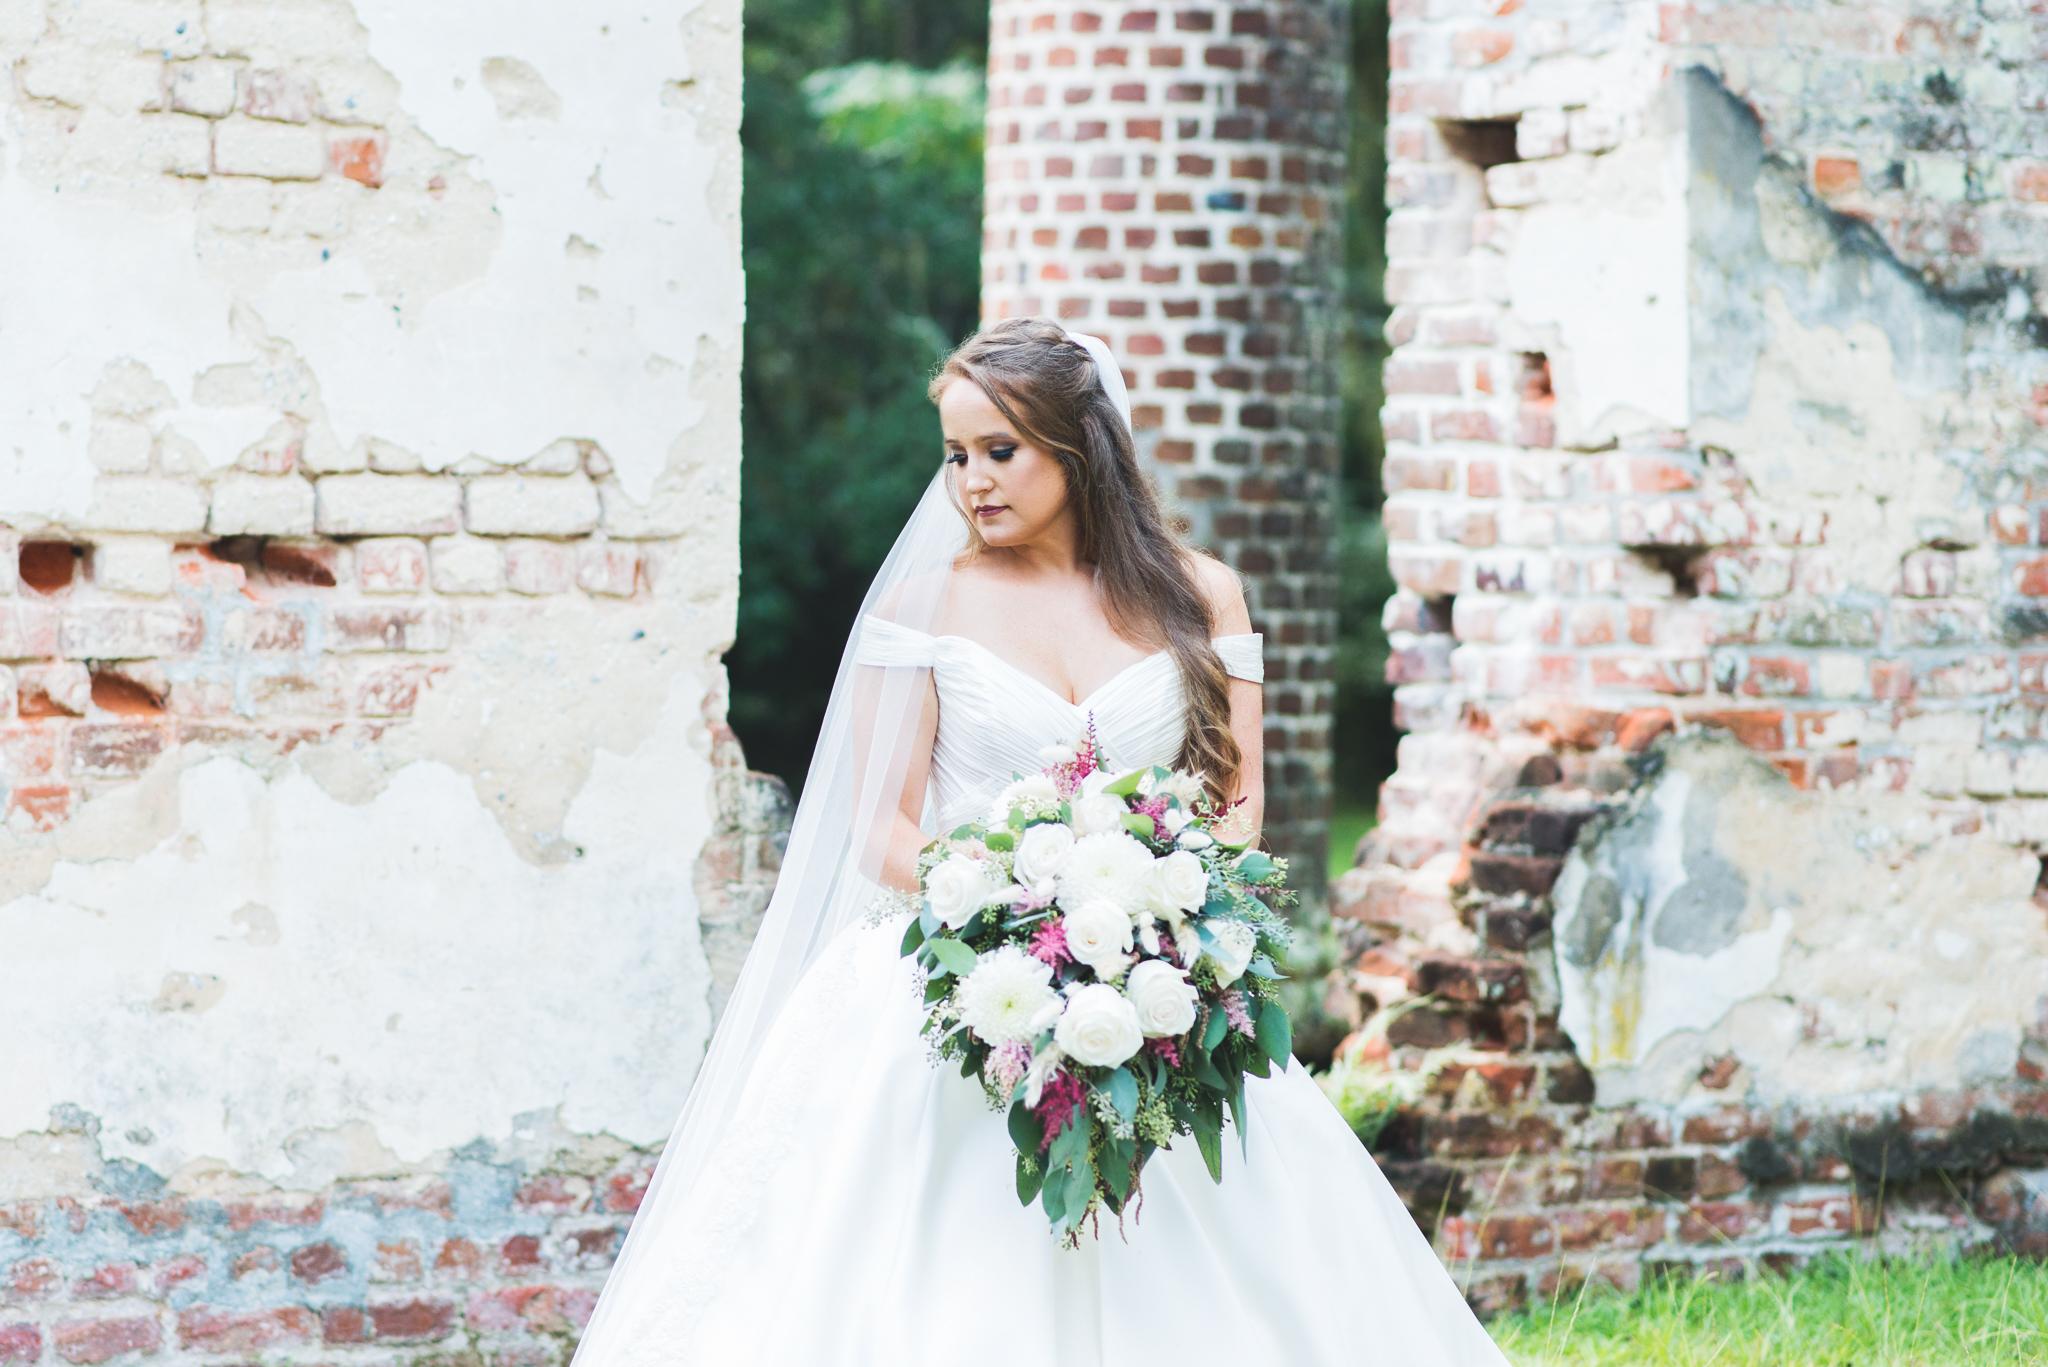 Bridals_AmberRay_blog-12.jpg